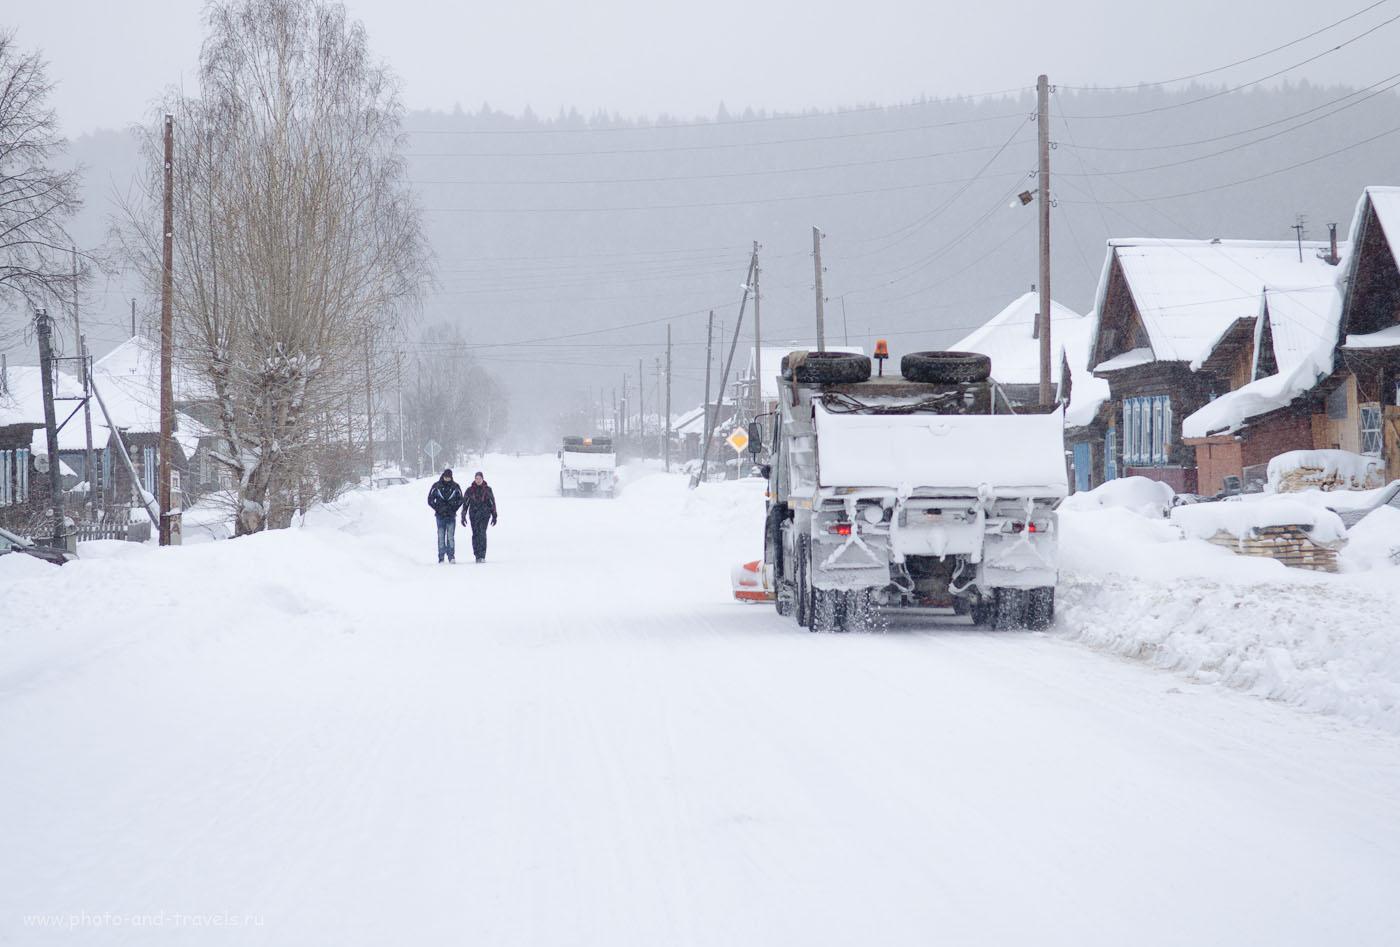 Фото 36. Уборка снега. Параметры камеры: 1/250 сек, 0 eV, приоритет диафрагмы, f/4, 55 мм, 250